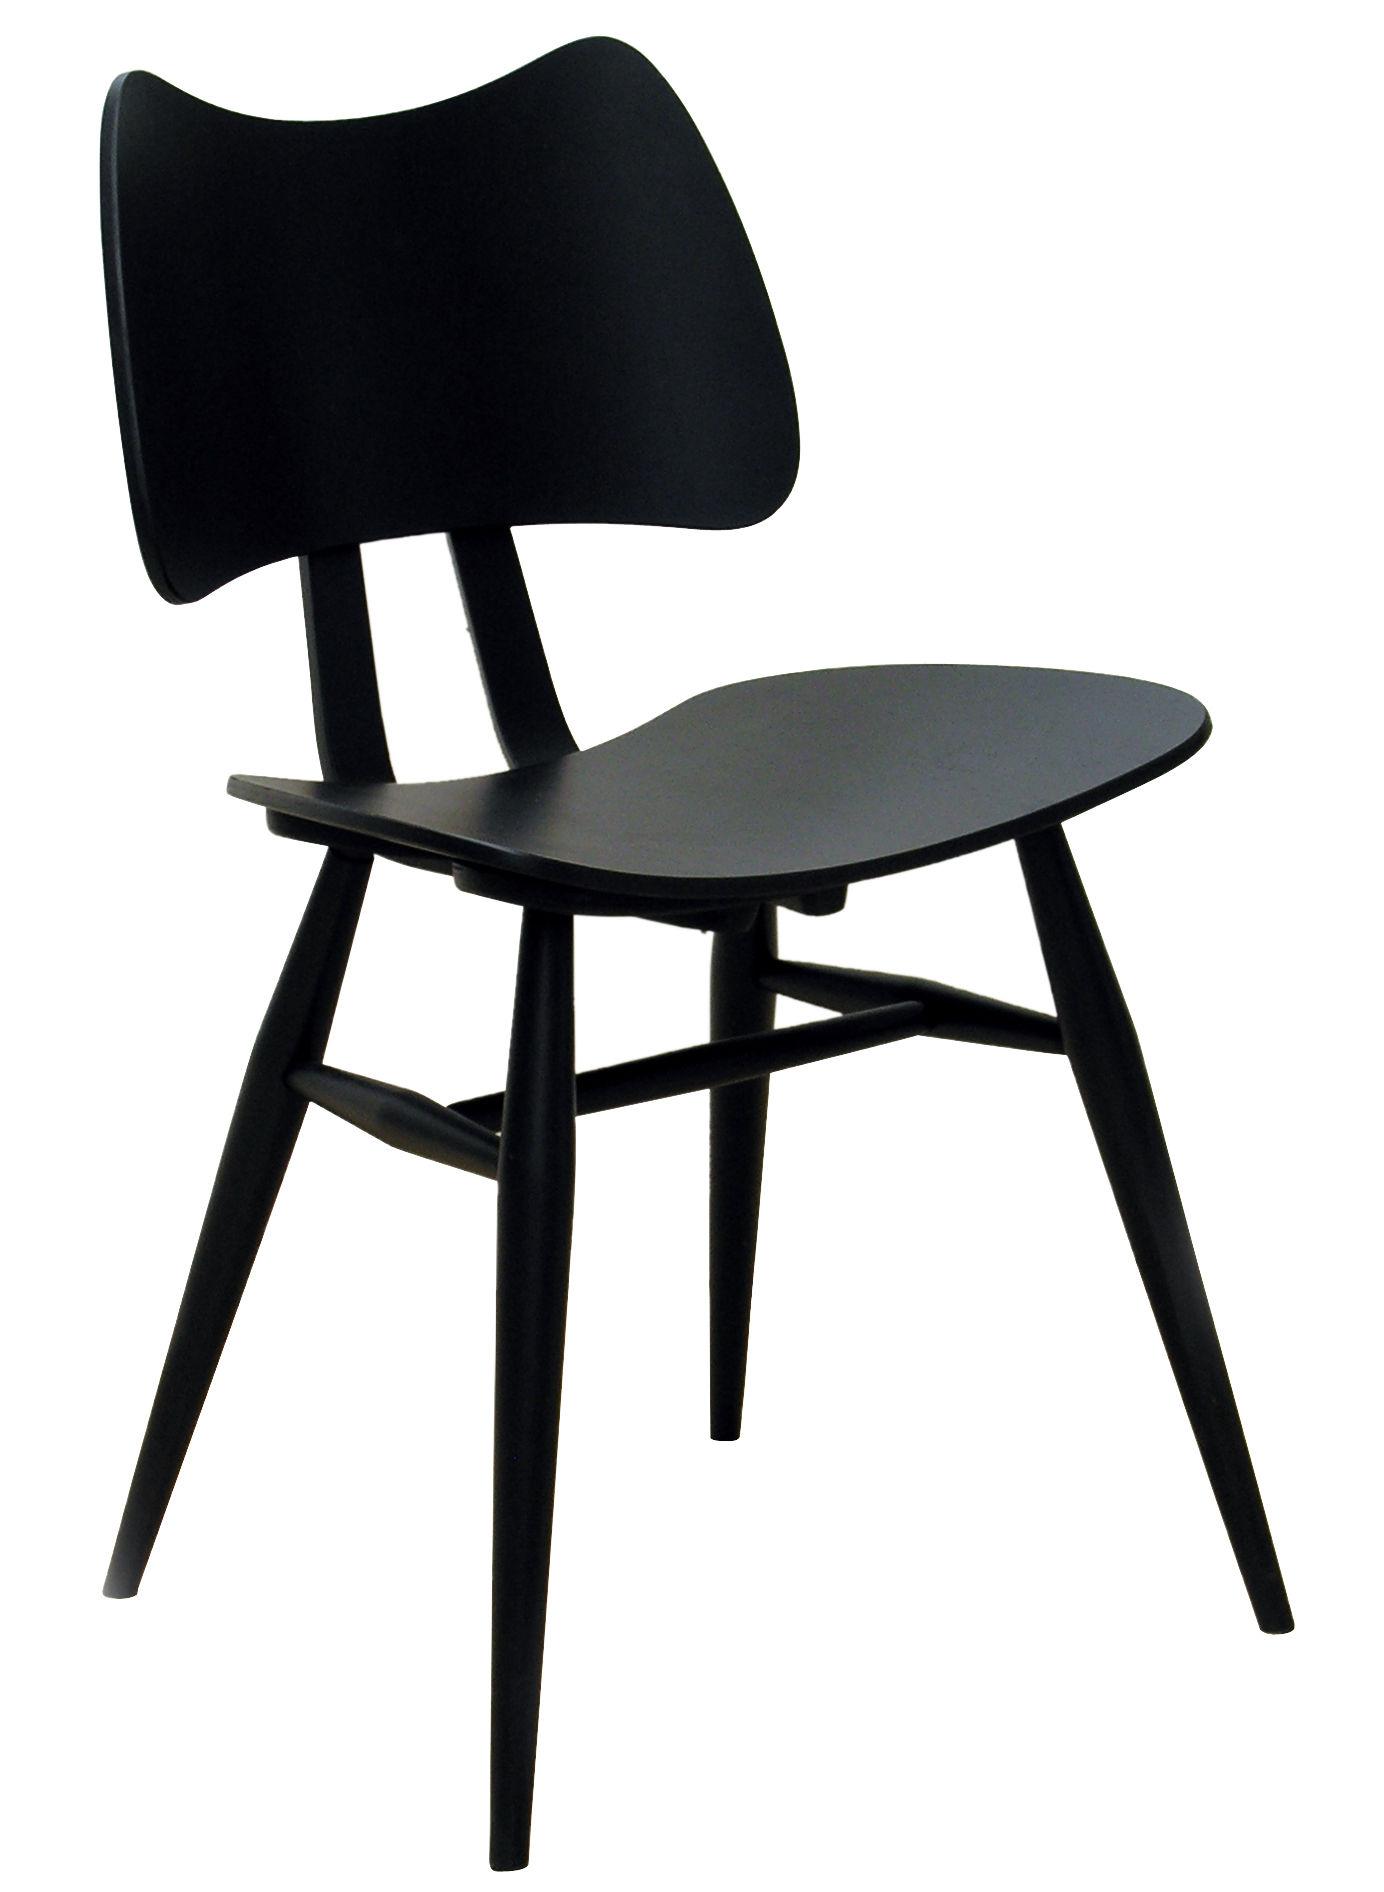 Möbel - Stühle  - Butterfly Stuhl / Neuauflage des Originals aus dem Jahr 1958 - Ercol - Schwarz - Contreplaqué de orme, massive Buche